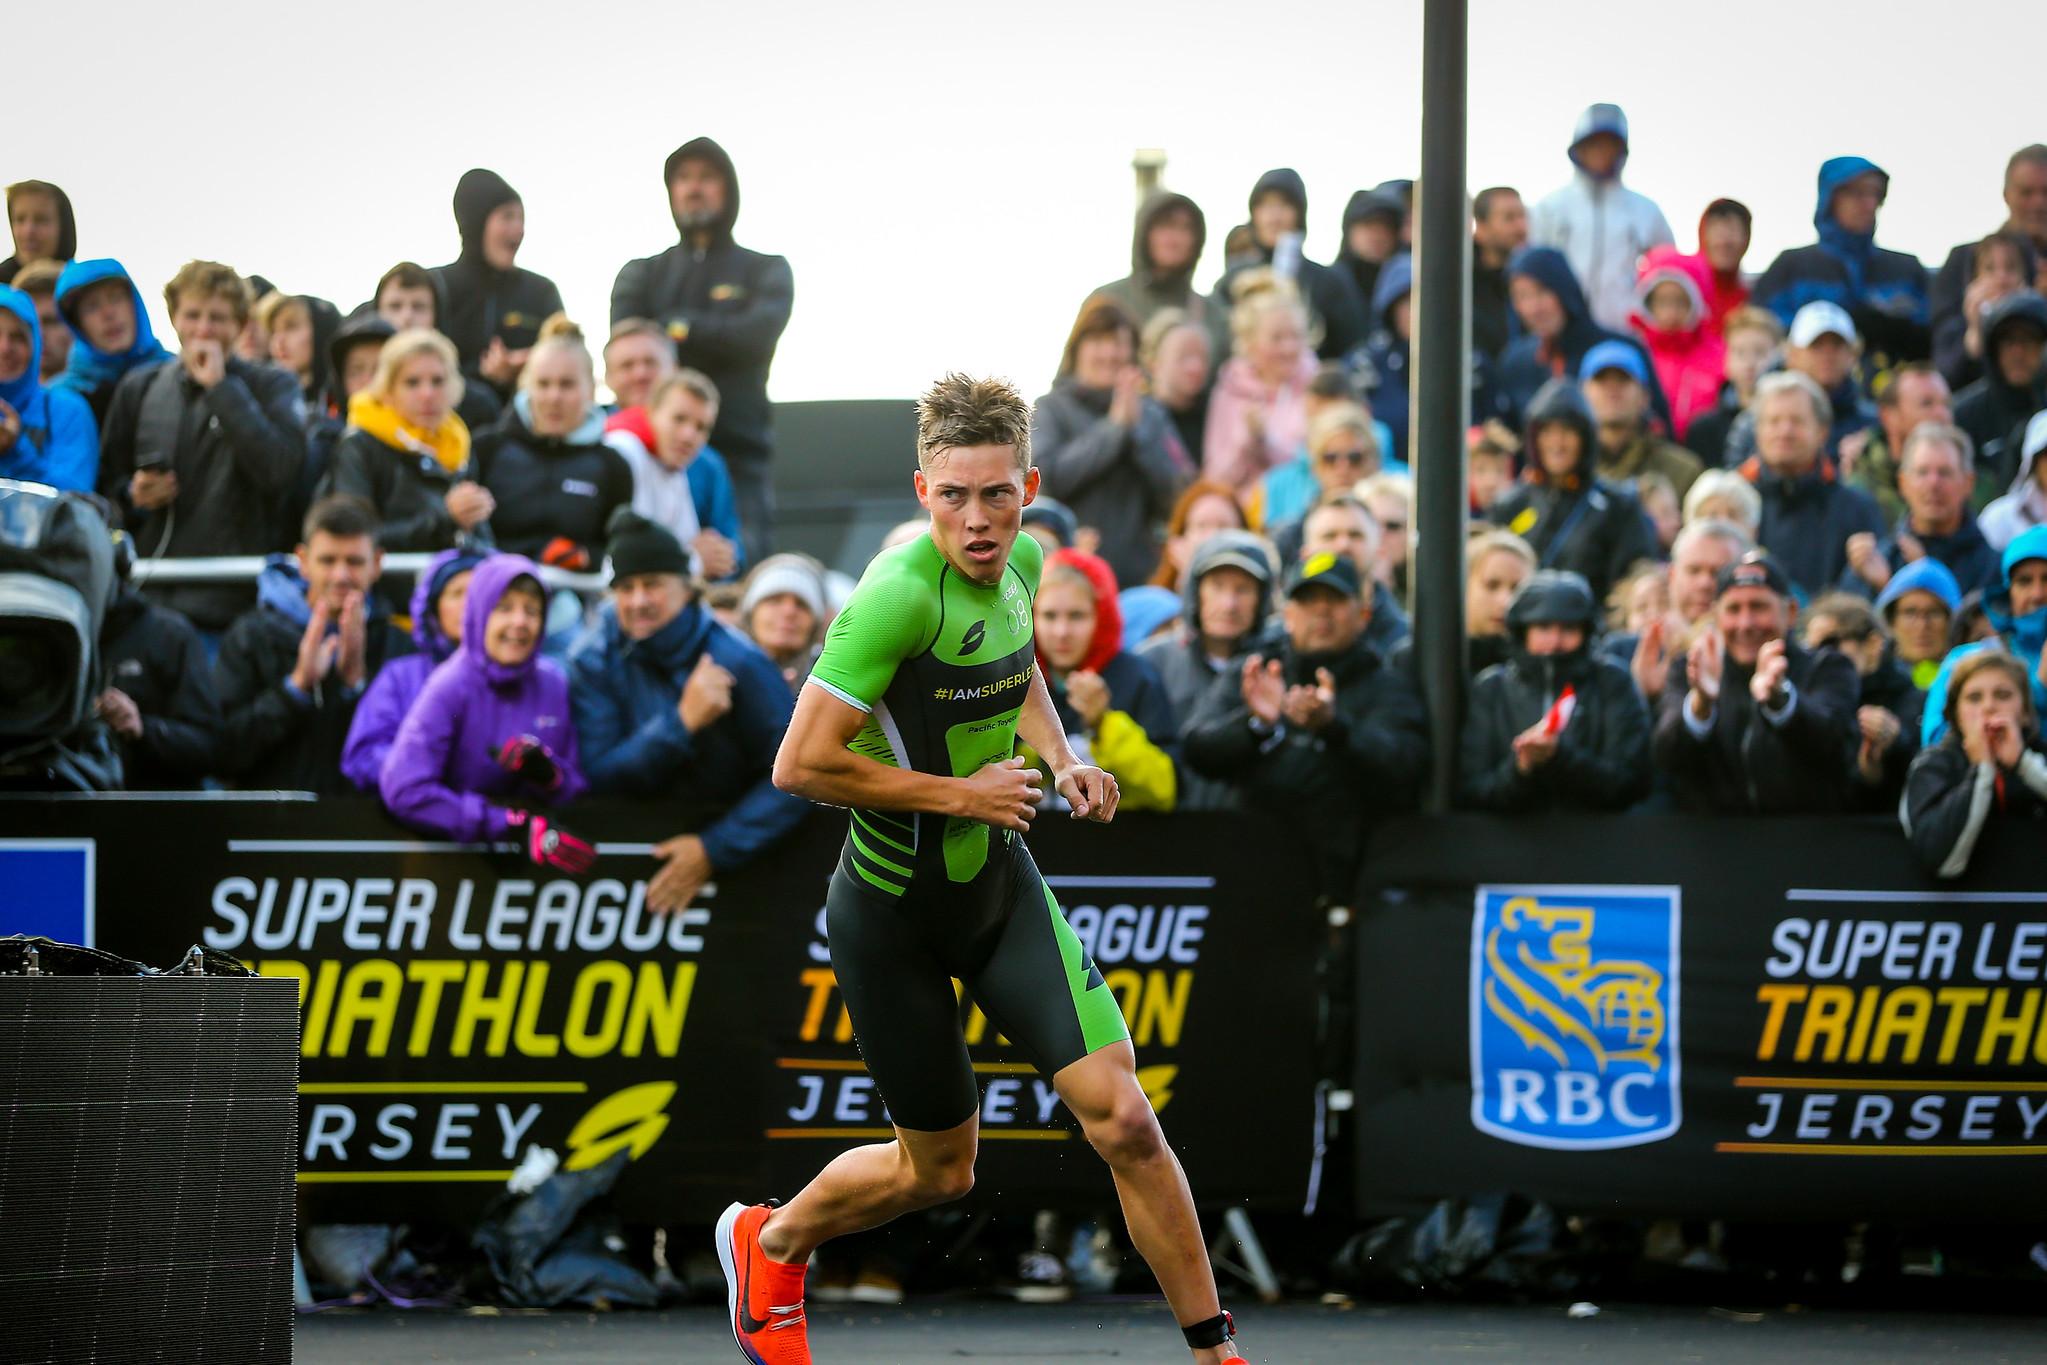 Super League Triathlon Jersey 2019